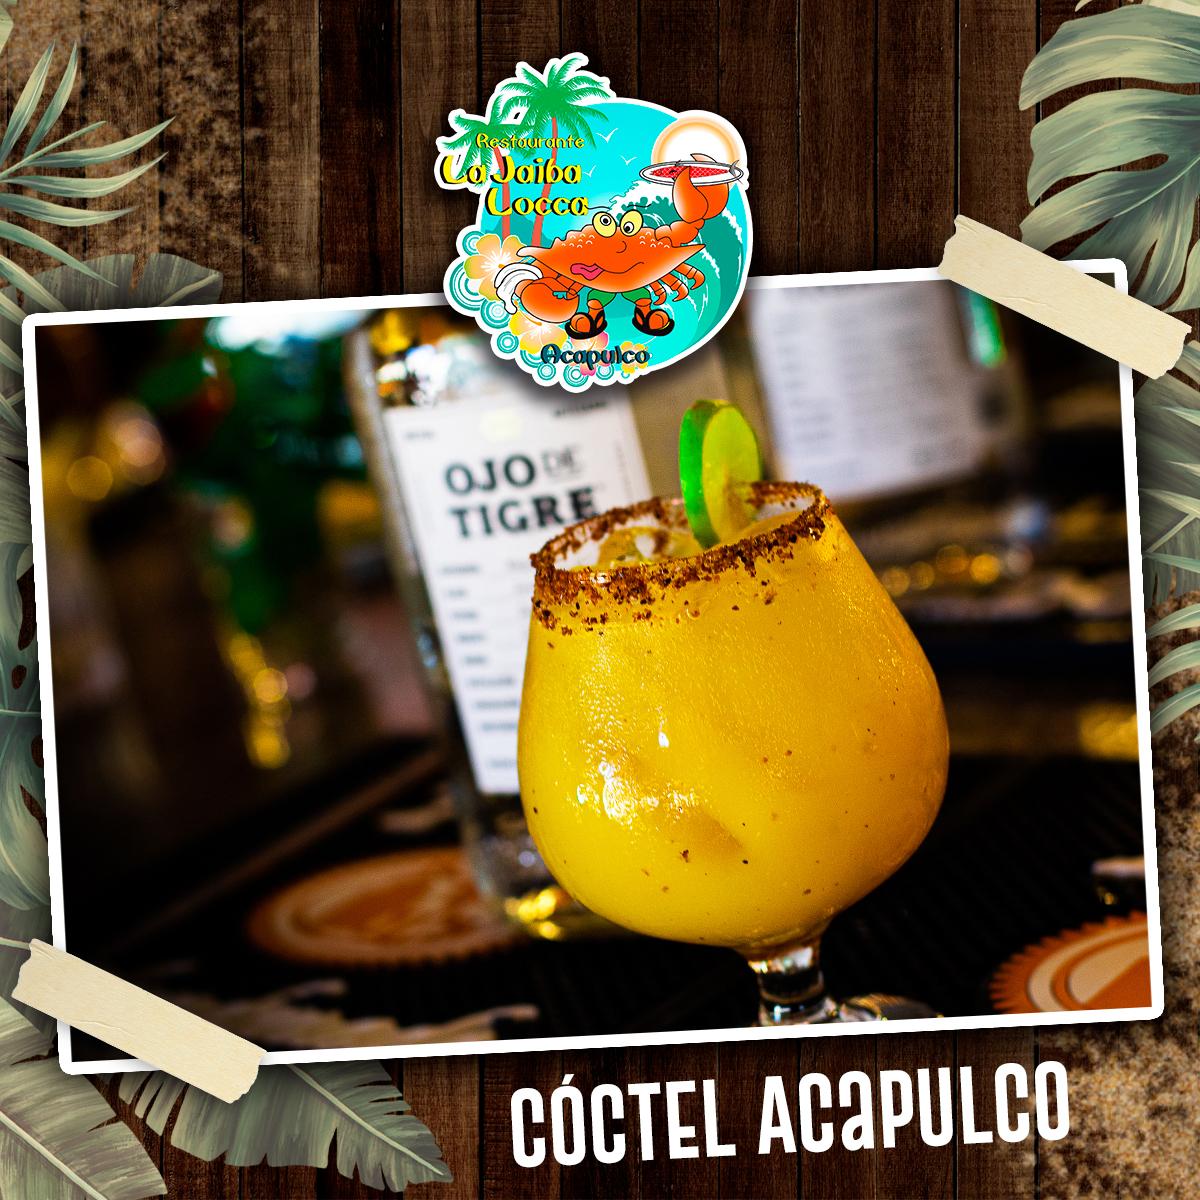 https://0201.nccdn.net/1_2/000/000/101/962/c--ctel-acapulco.jpg